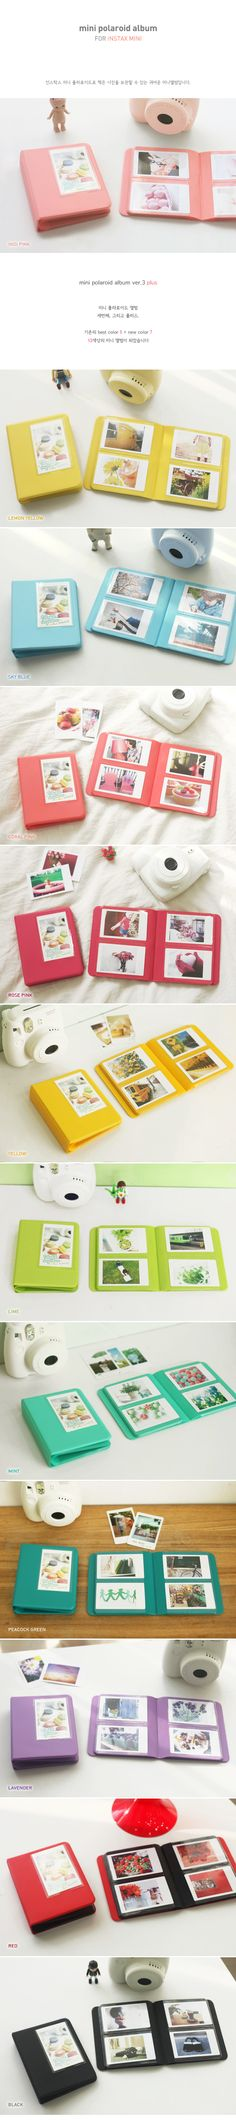 New Polaroid Photo Album for Fuji Instax mini ver 3 plus Indi pink Fuji Instax Mini, Polaroid Instax Mini, Polaroid Photo Album, Fujifilm Instax Mini 8, Instax Camera, Polaroid Pictures, Polaroid Cameras, Instax Mini Ideas, Project Life